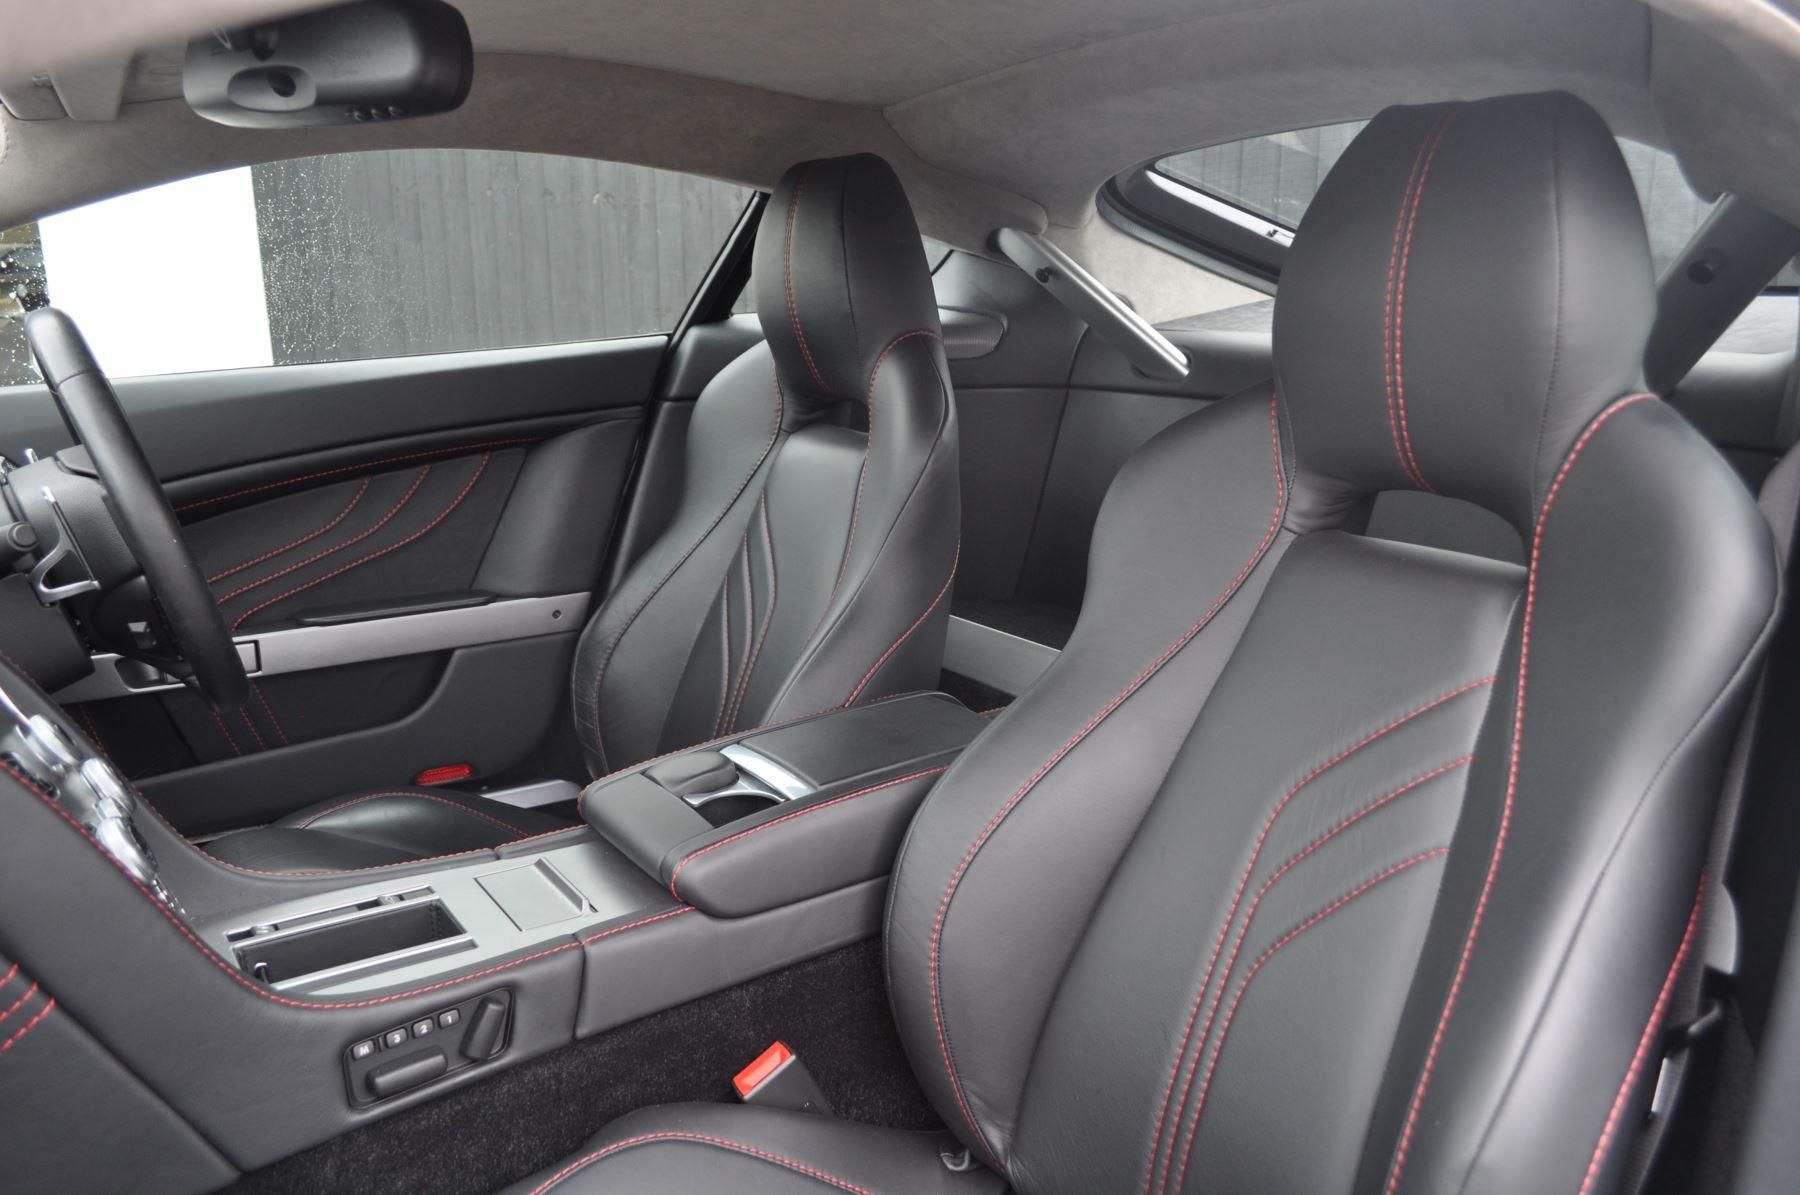 Aston Martin V8 Vantage S Coupe Coupe image 27